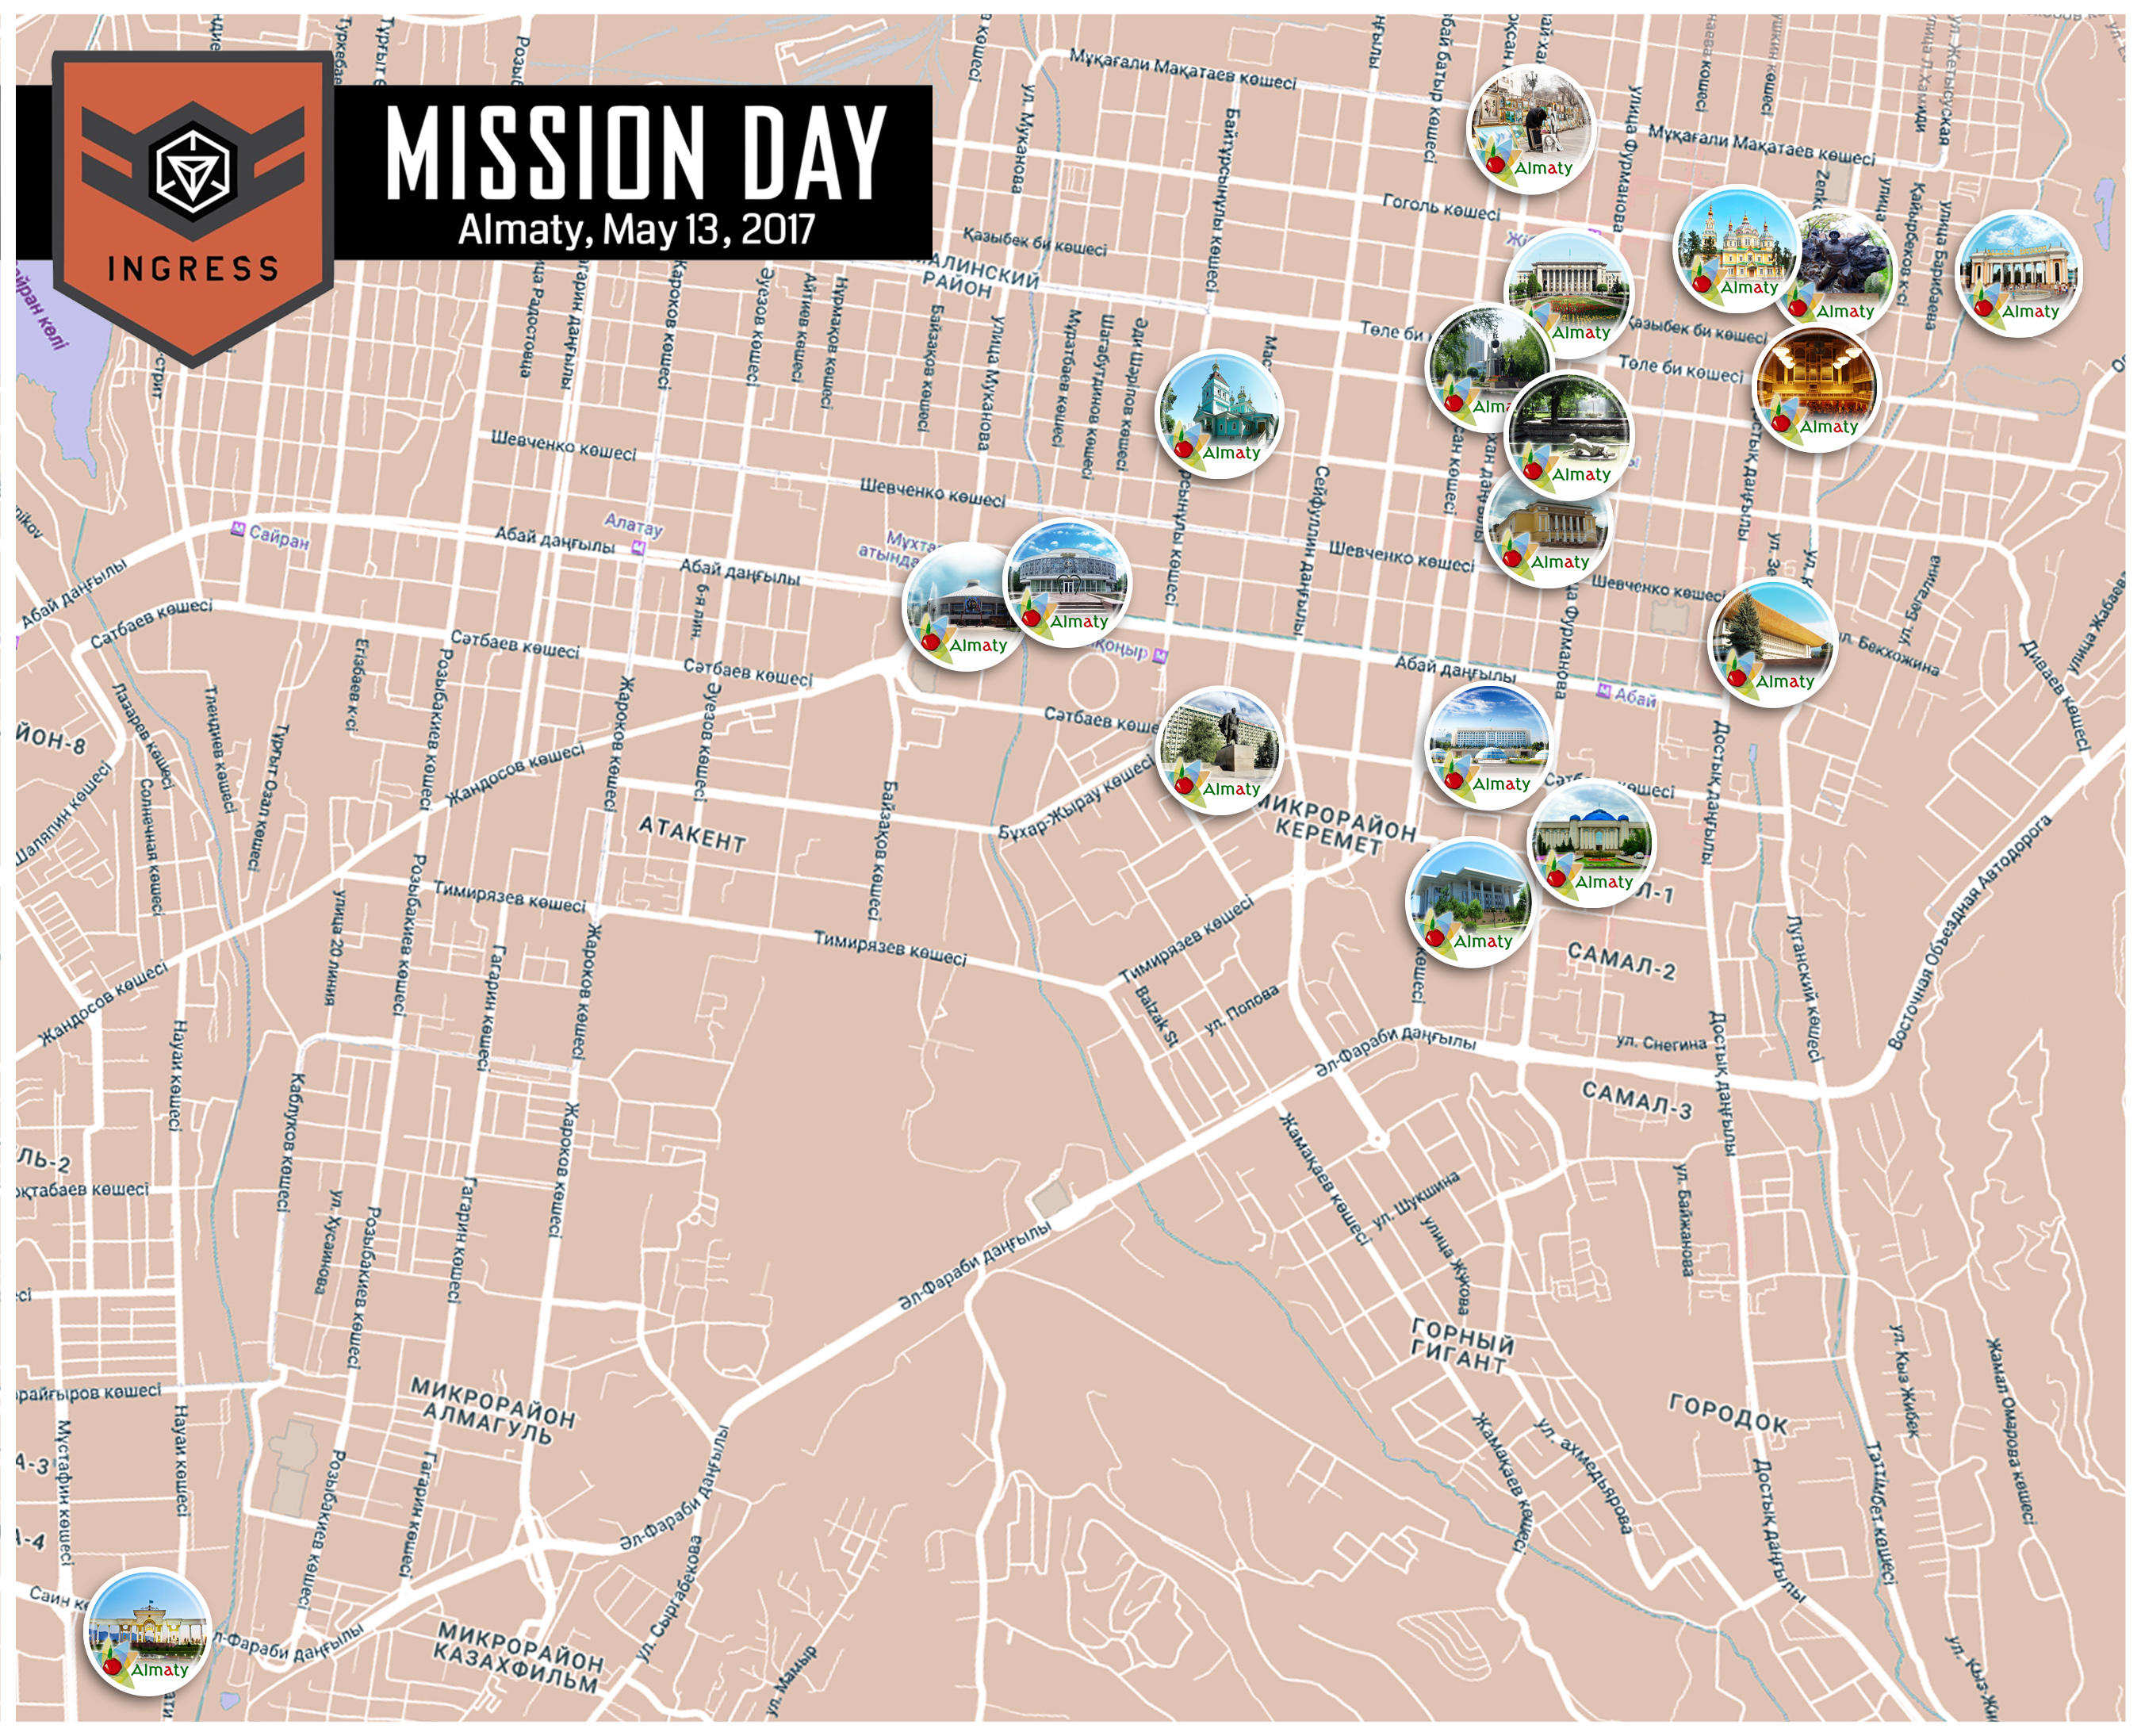 Mission Day Almaty